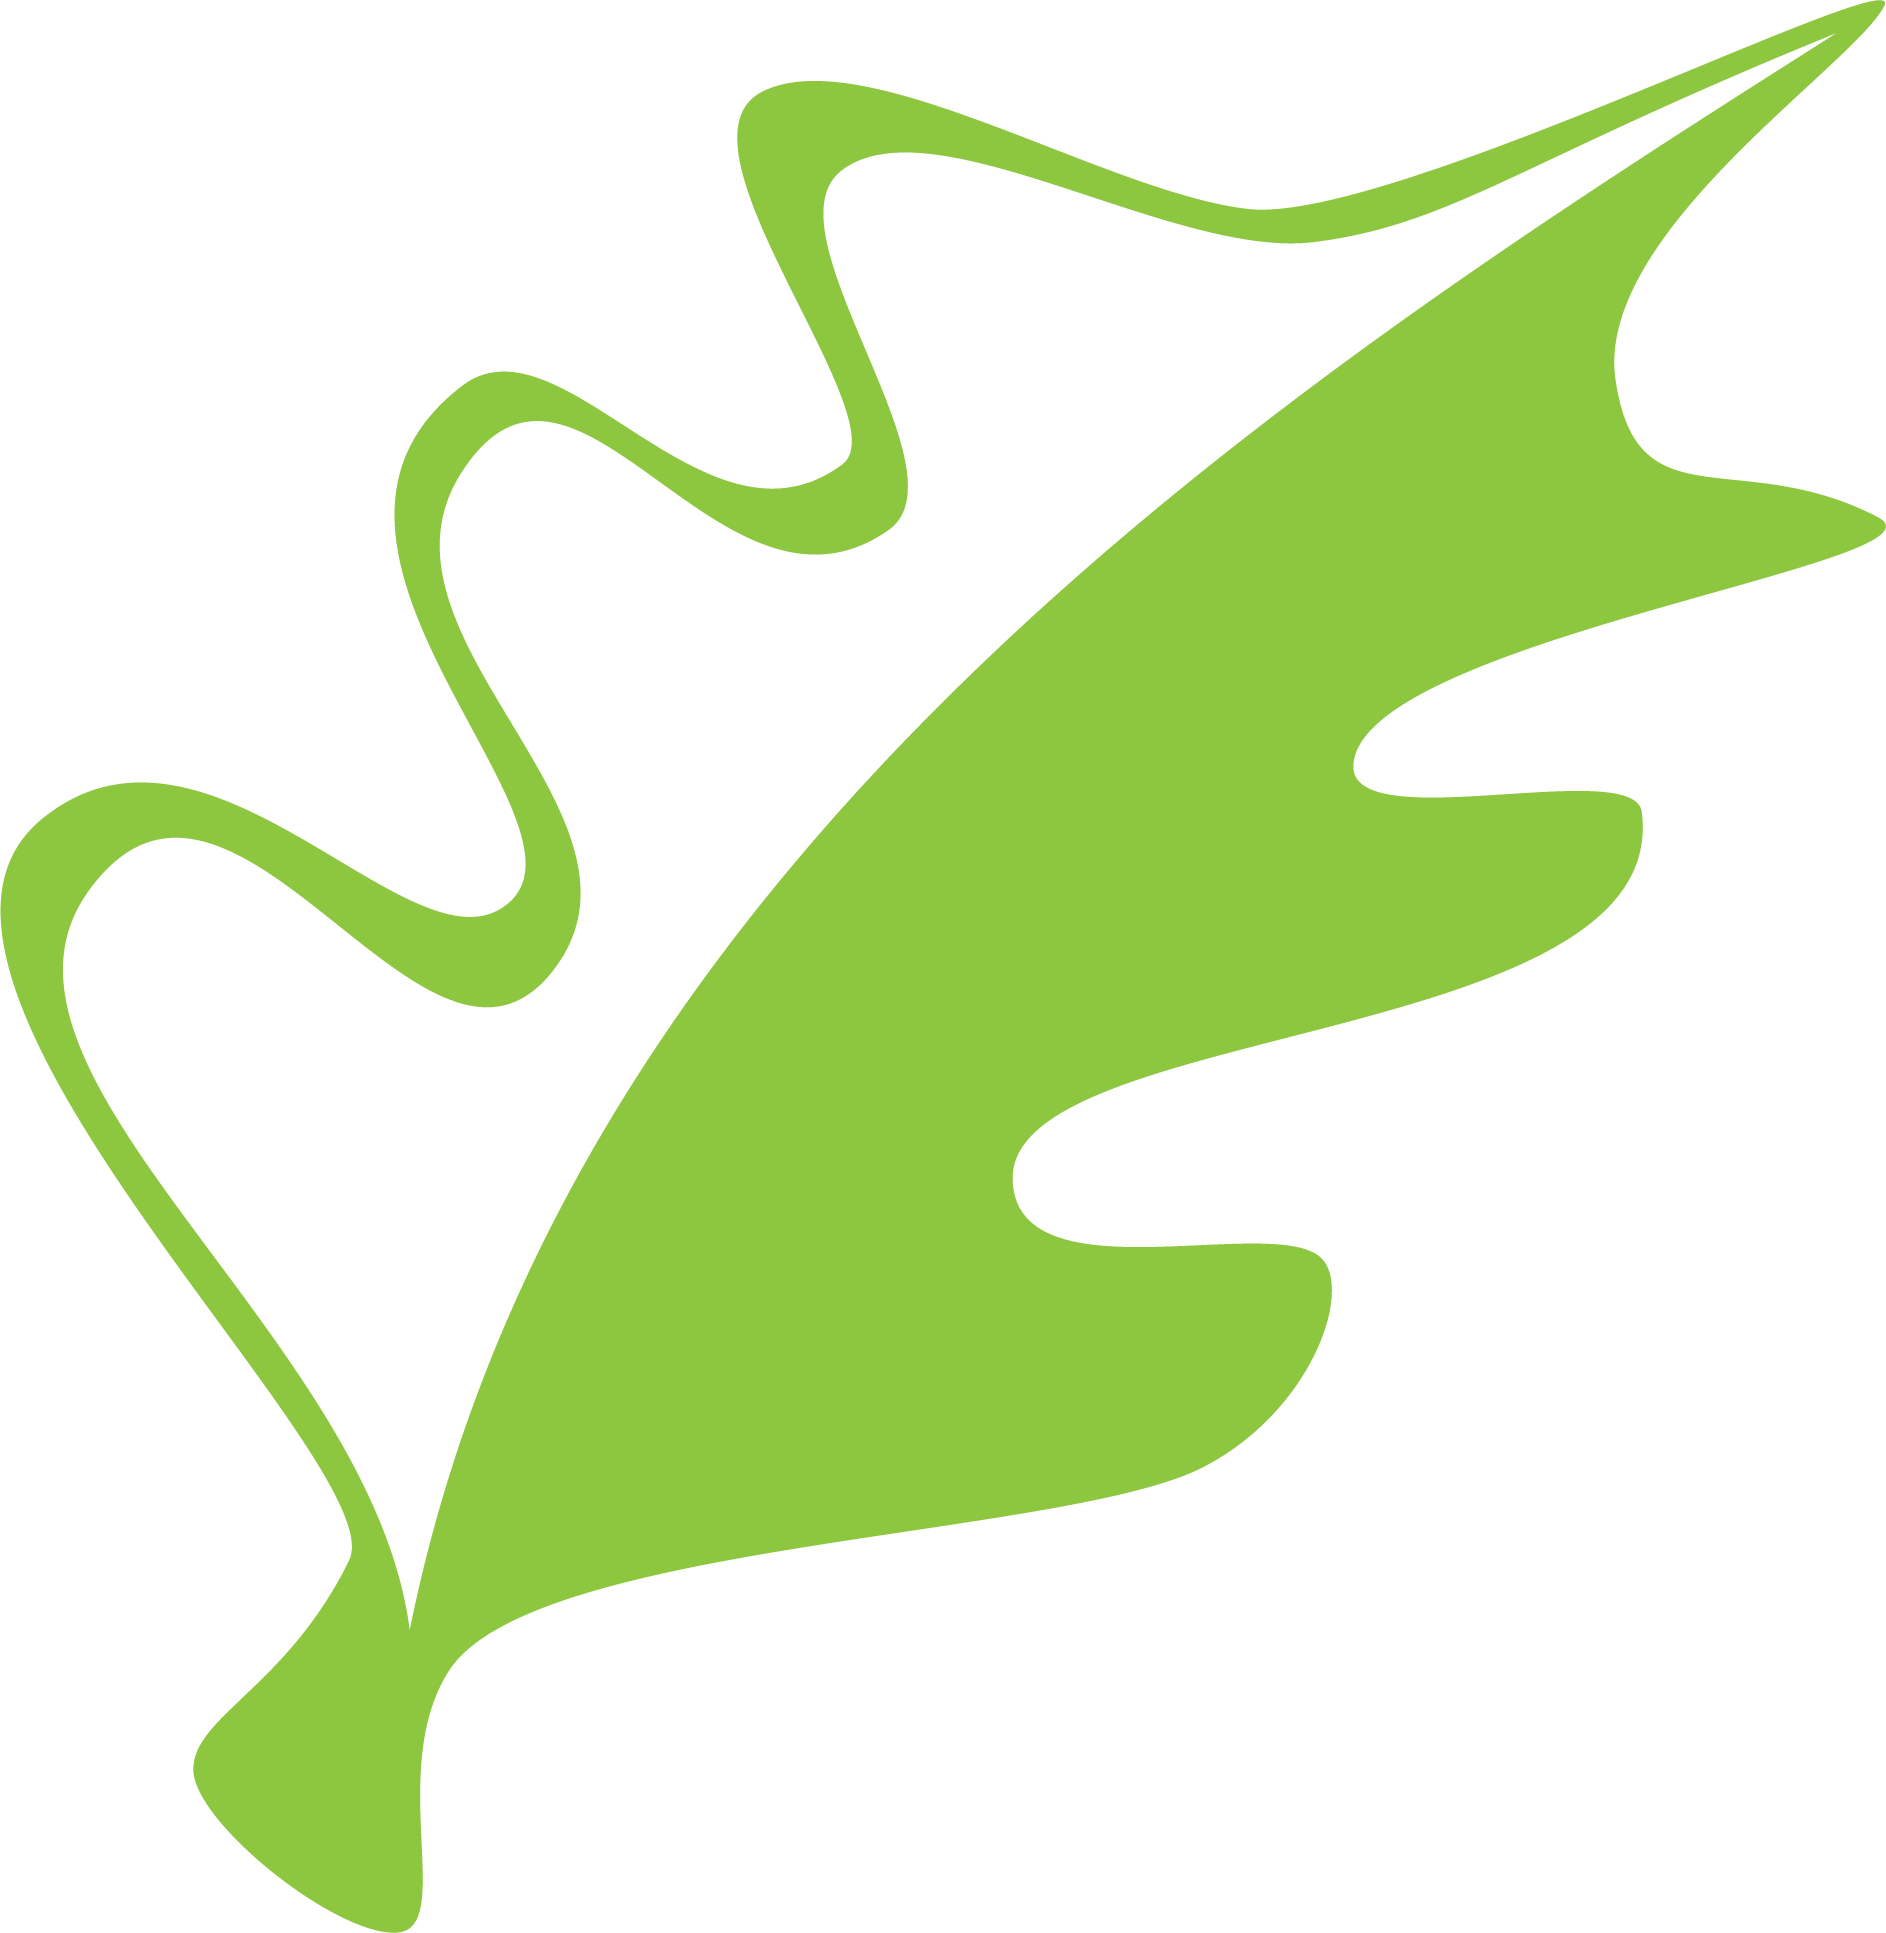 Green free download best. Golf clipart driving range